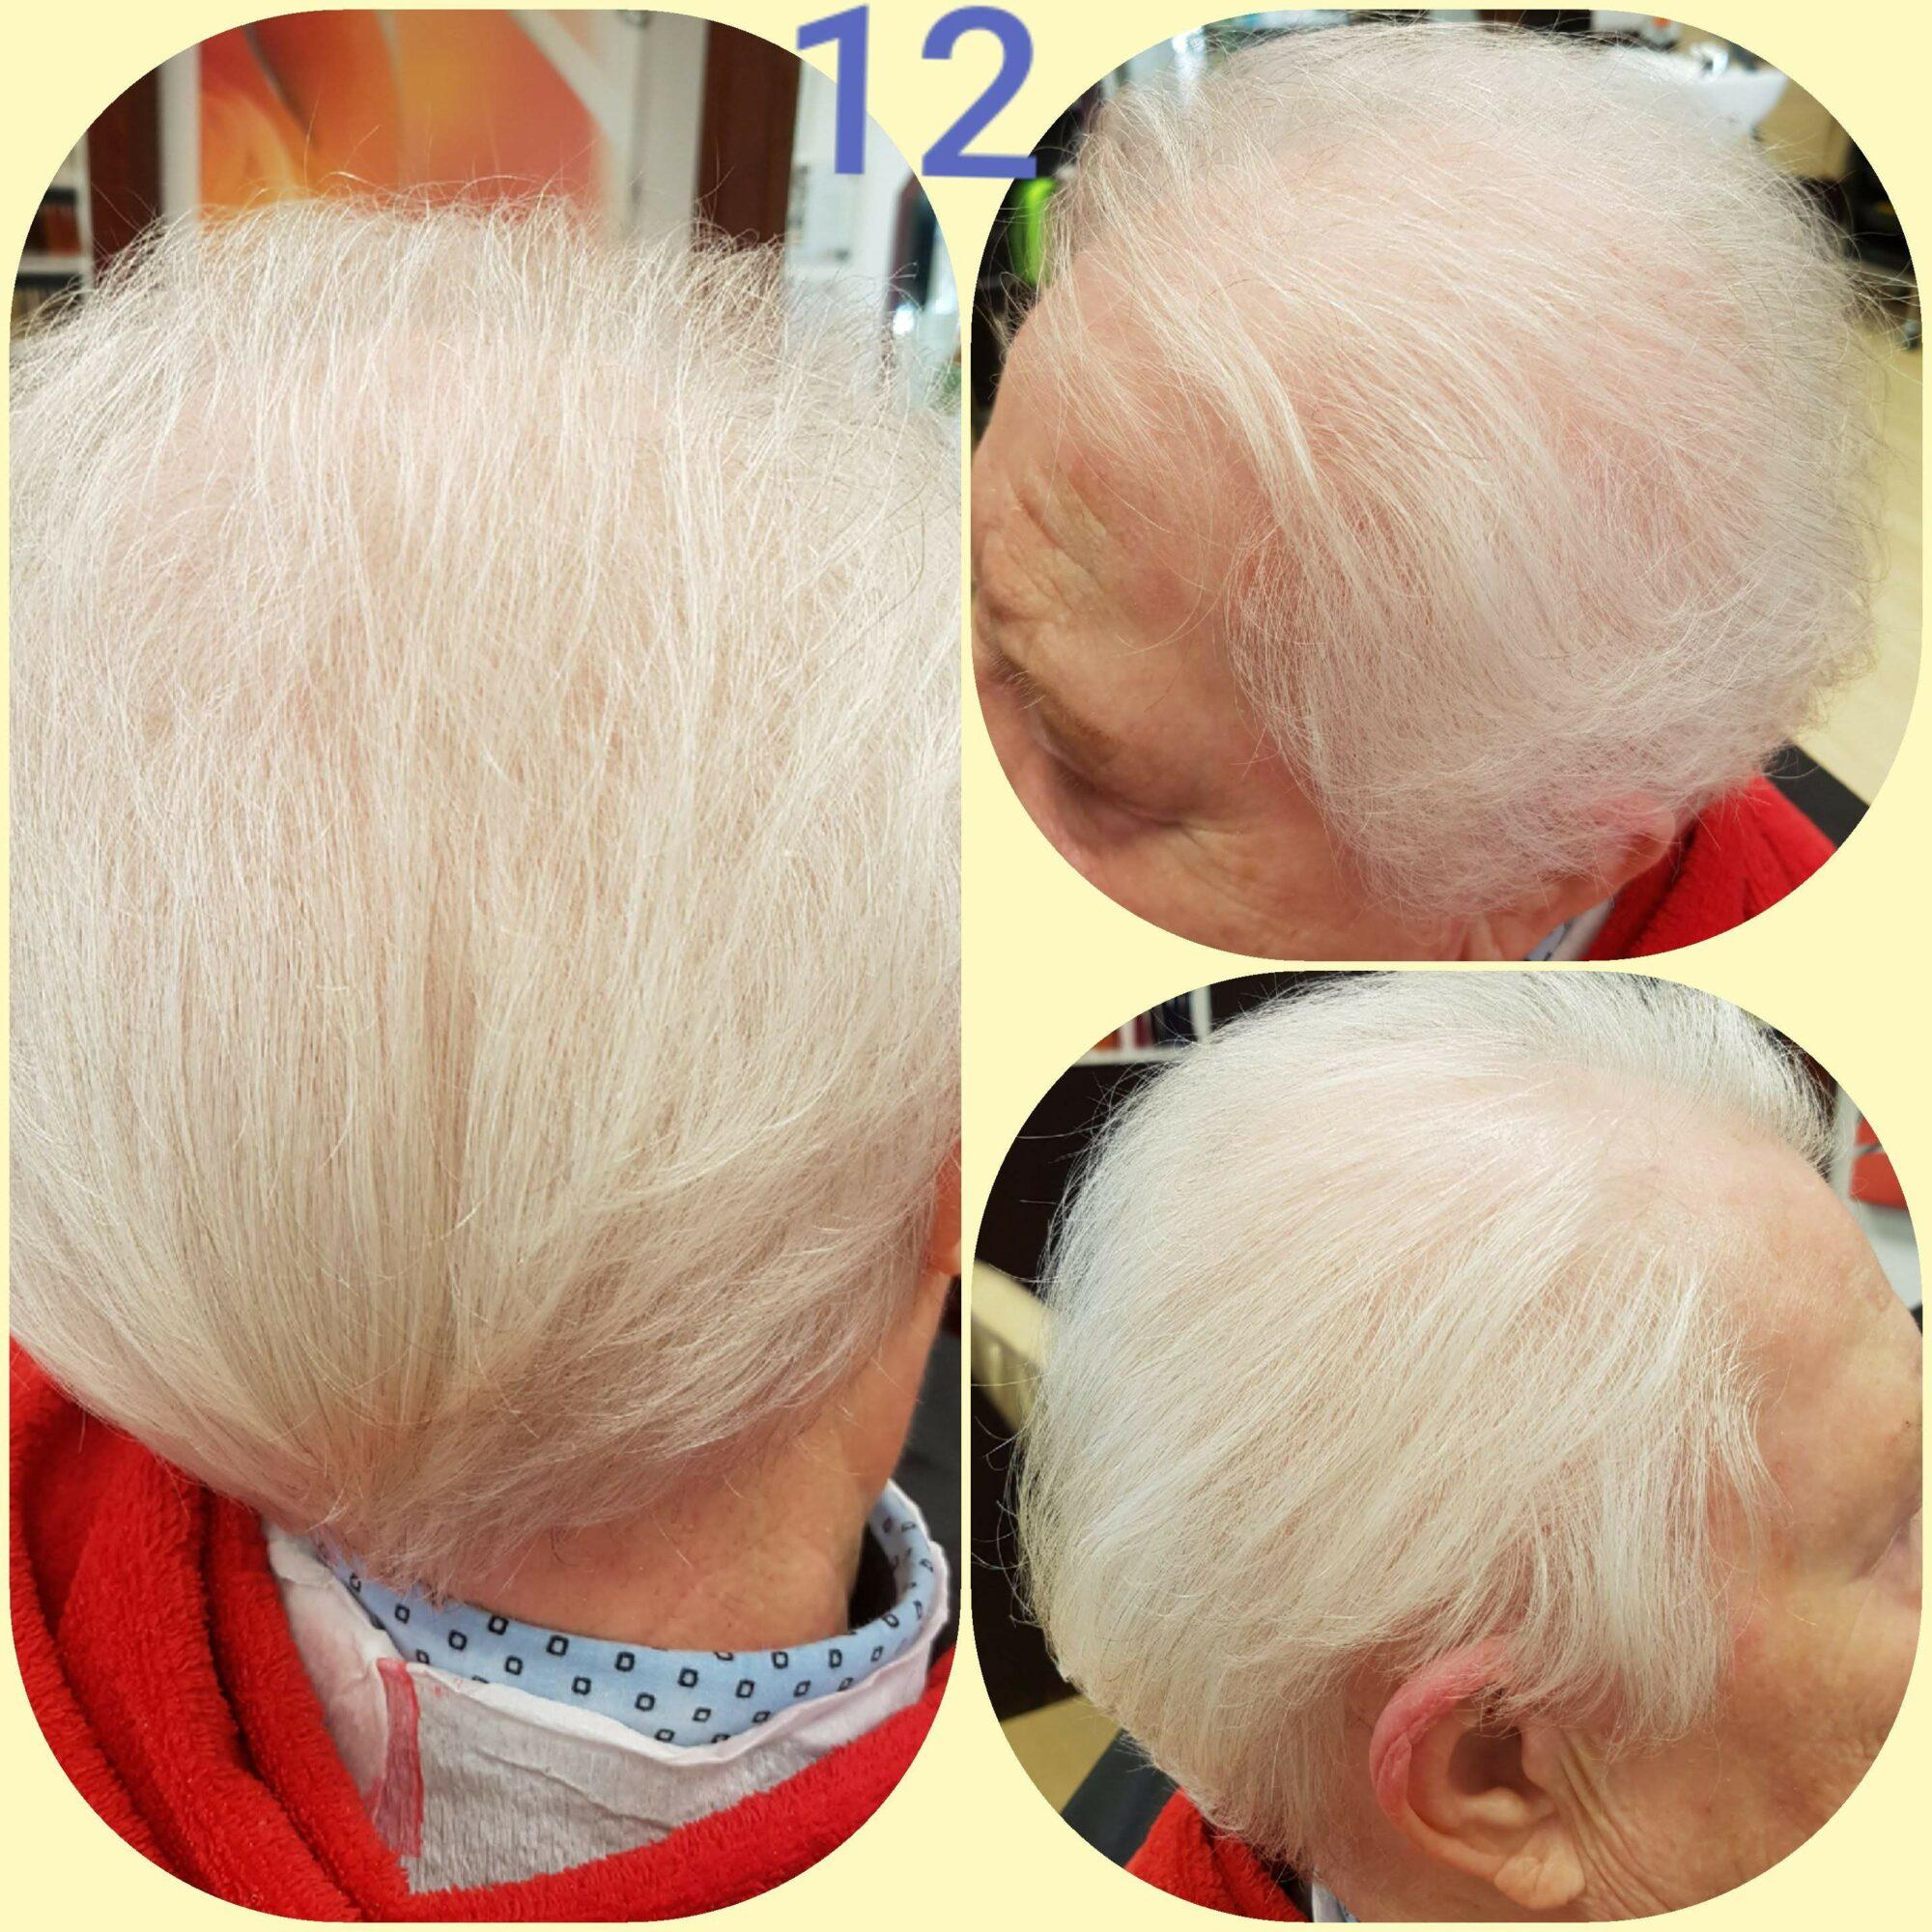 Lasertherapie gegen Haarausfall